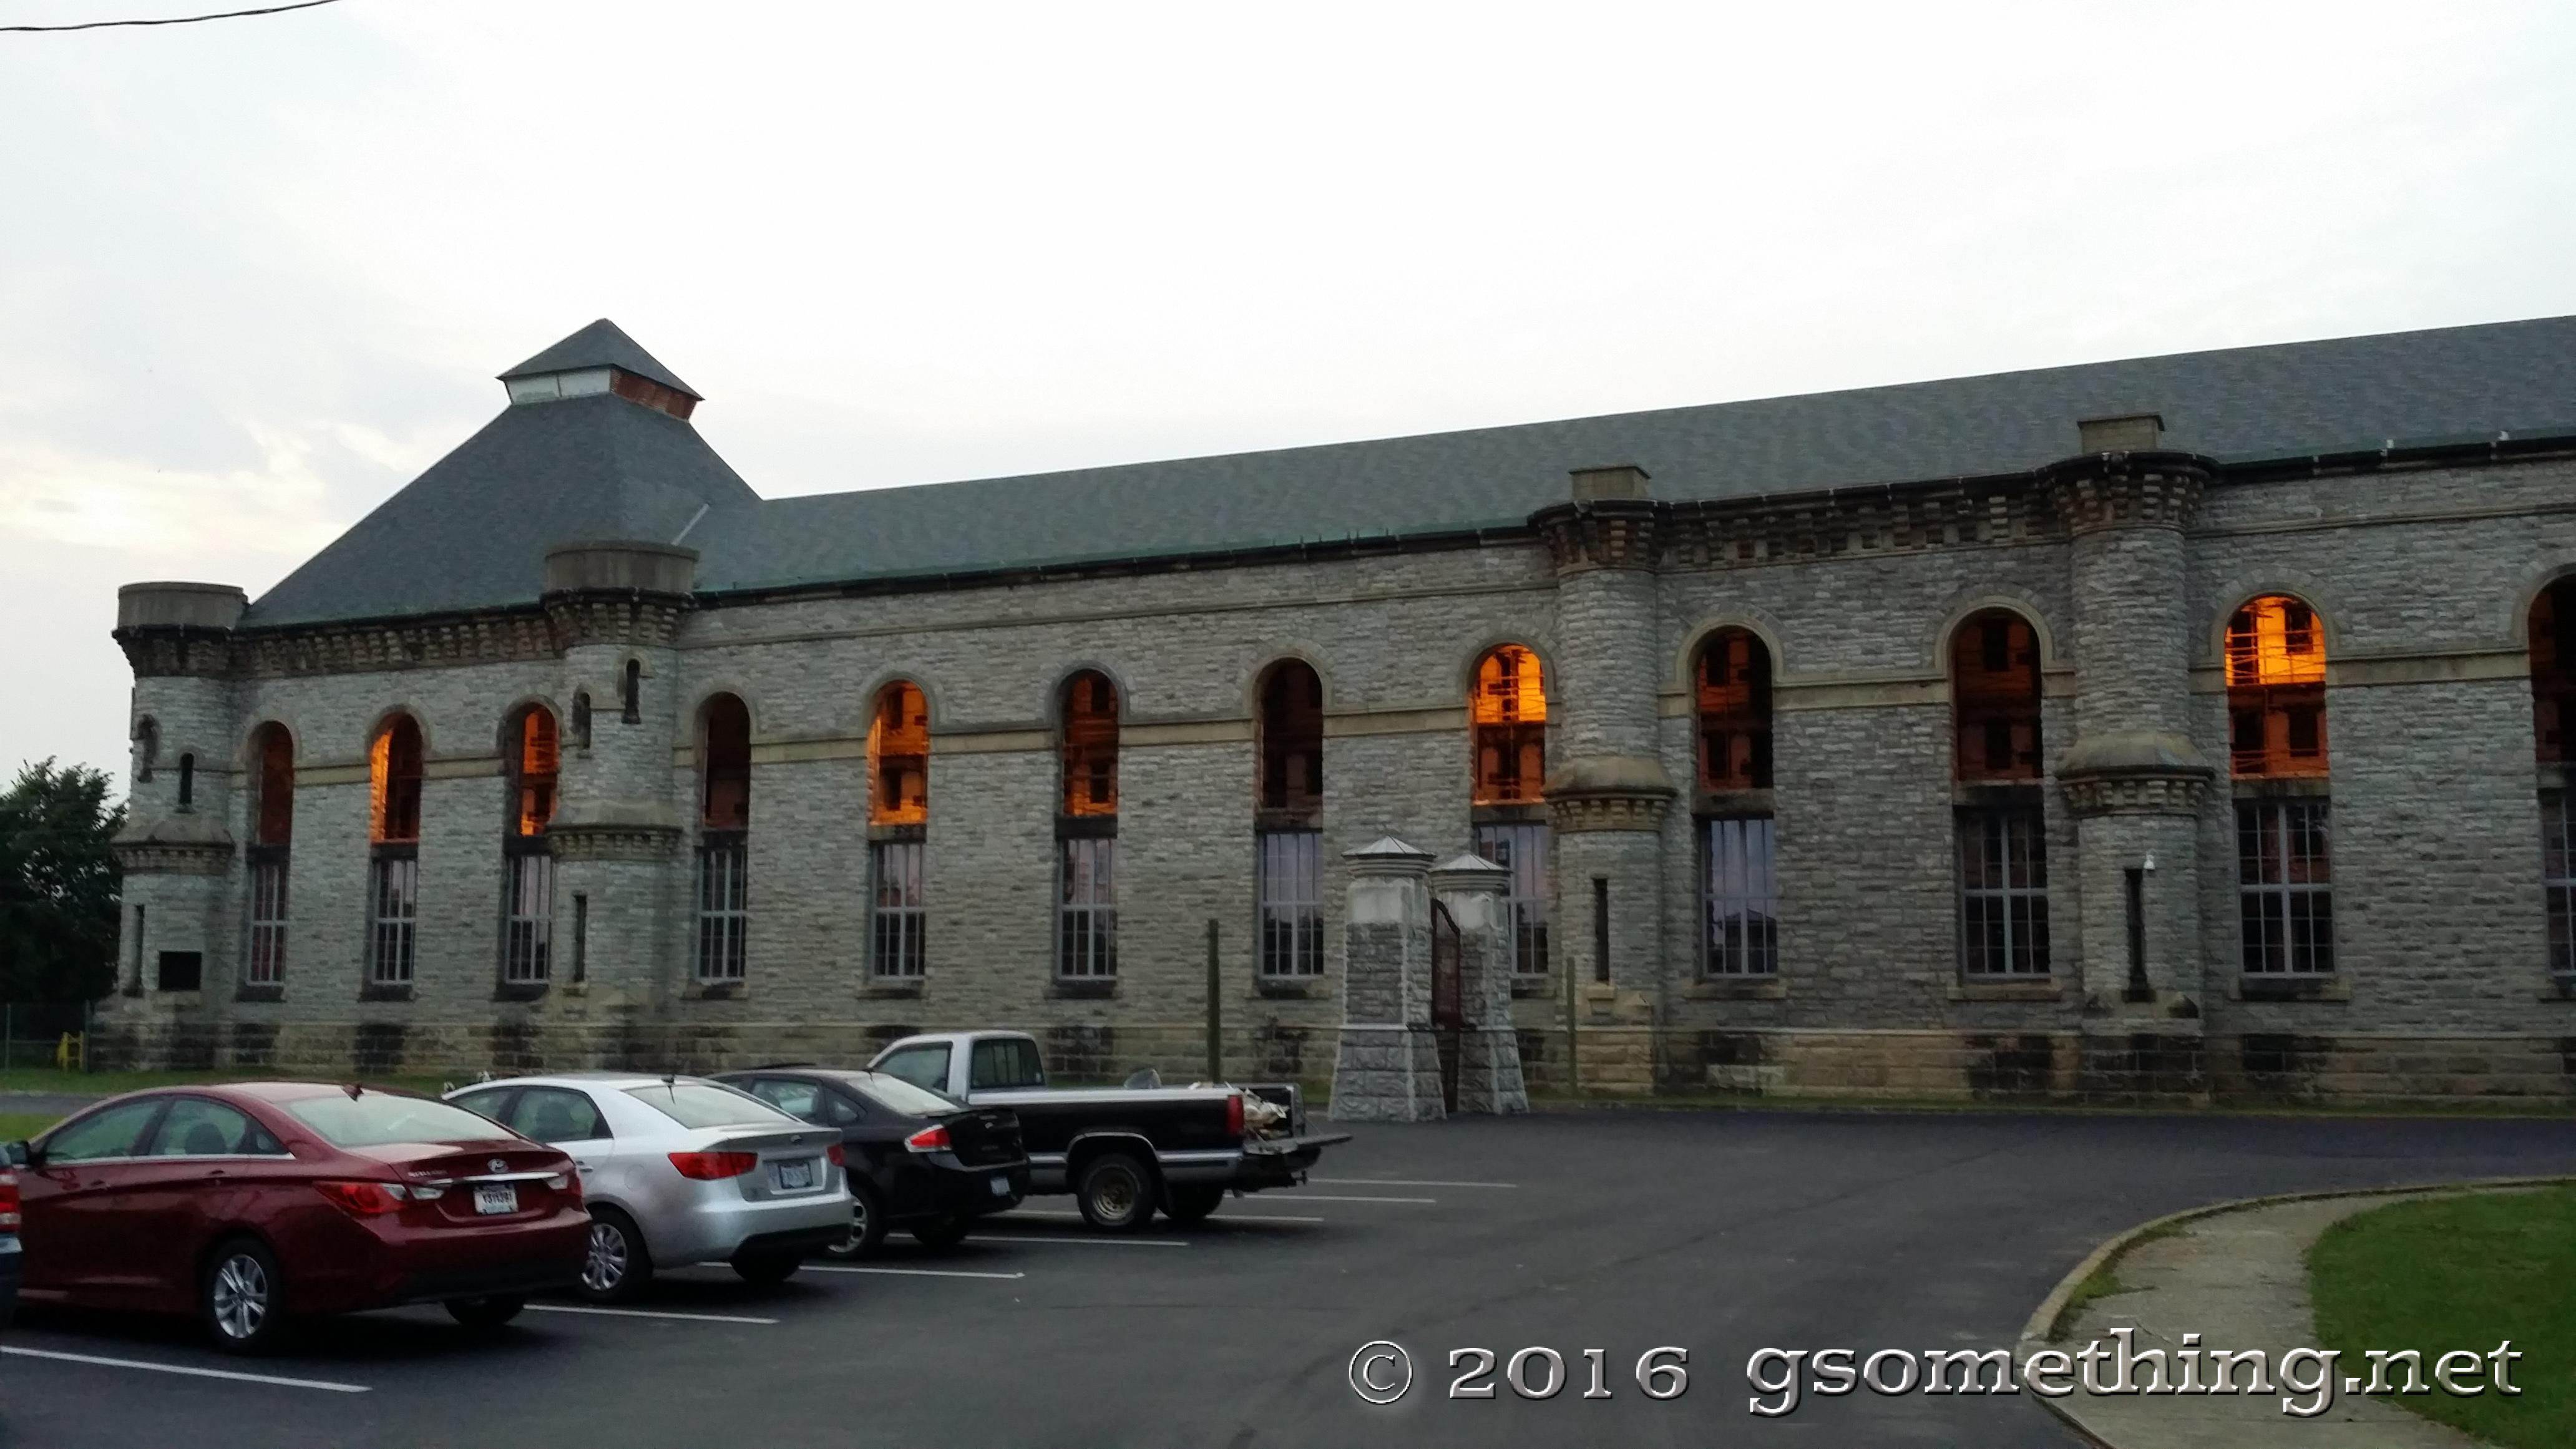 mansfield_reformatory_2nd_trip_28.jpg